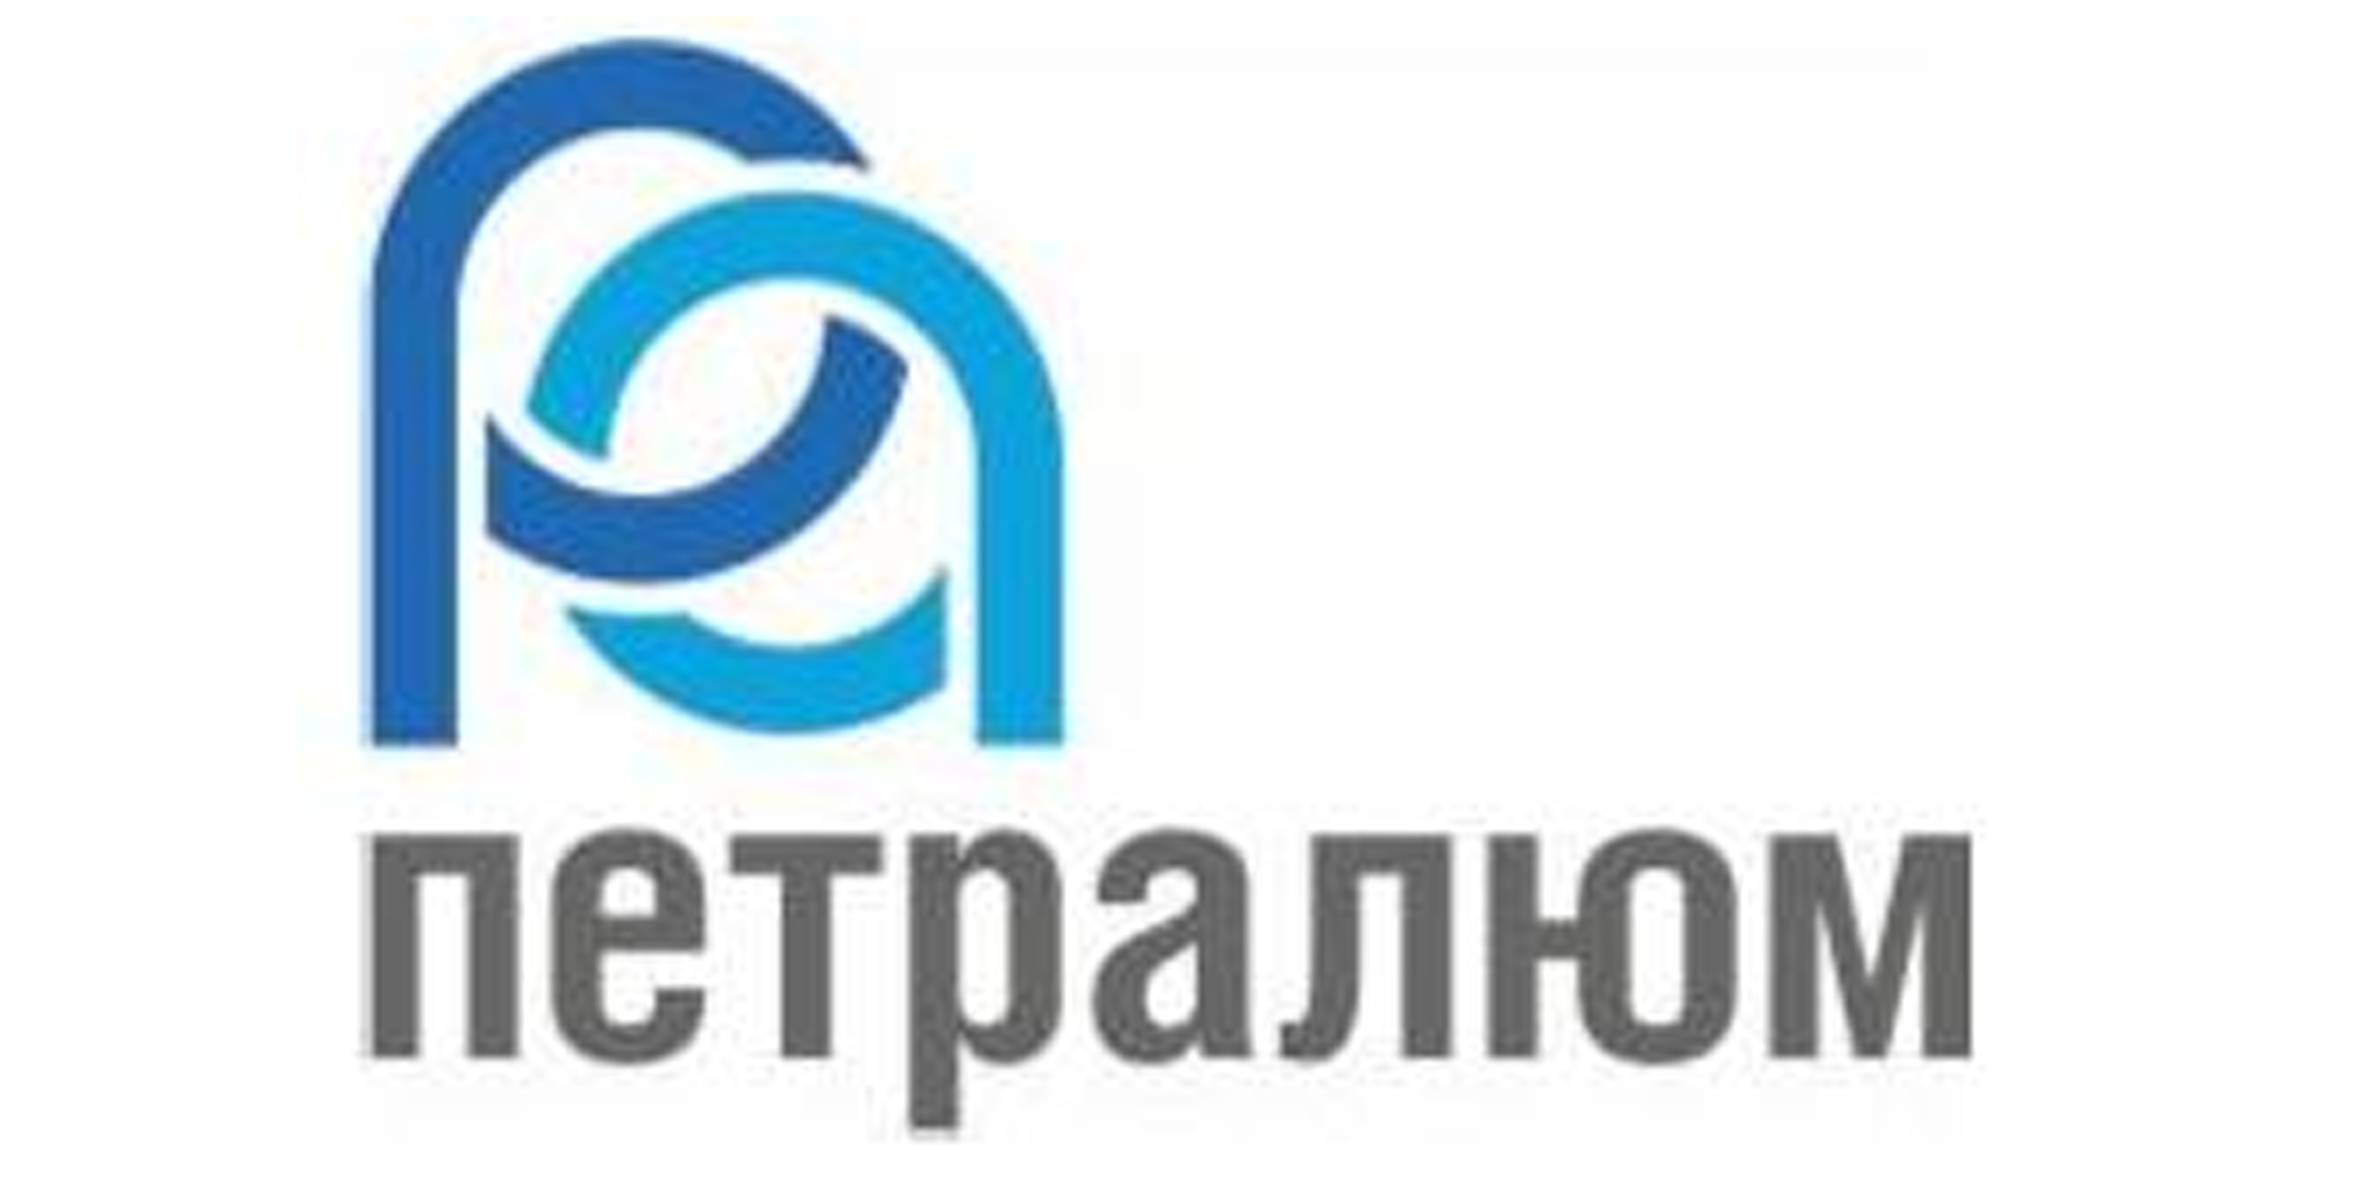 logo petralum